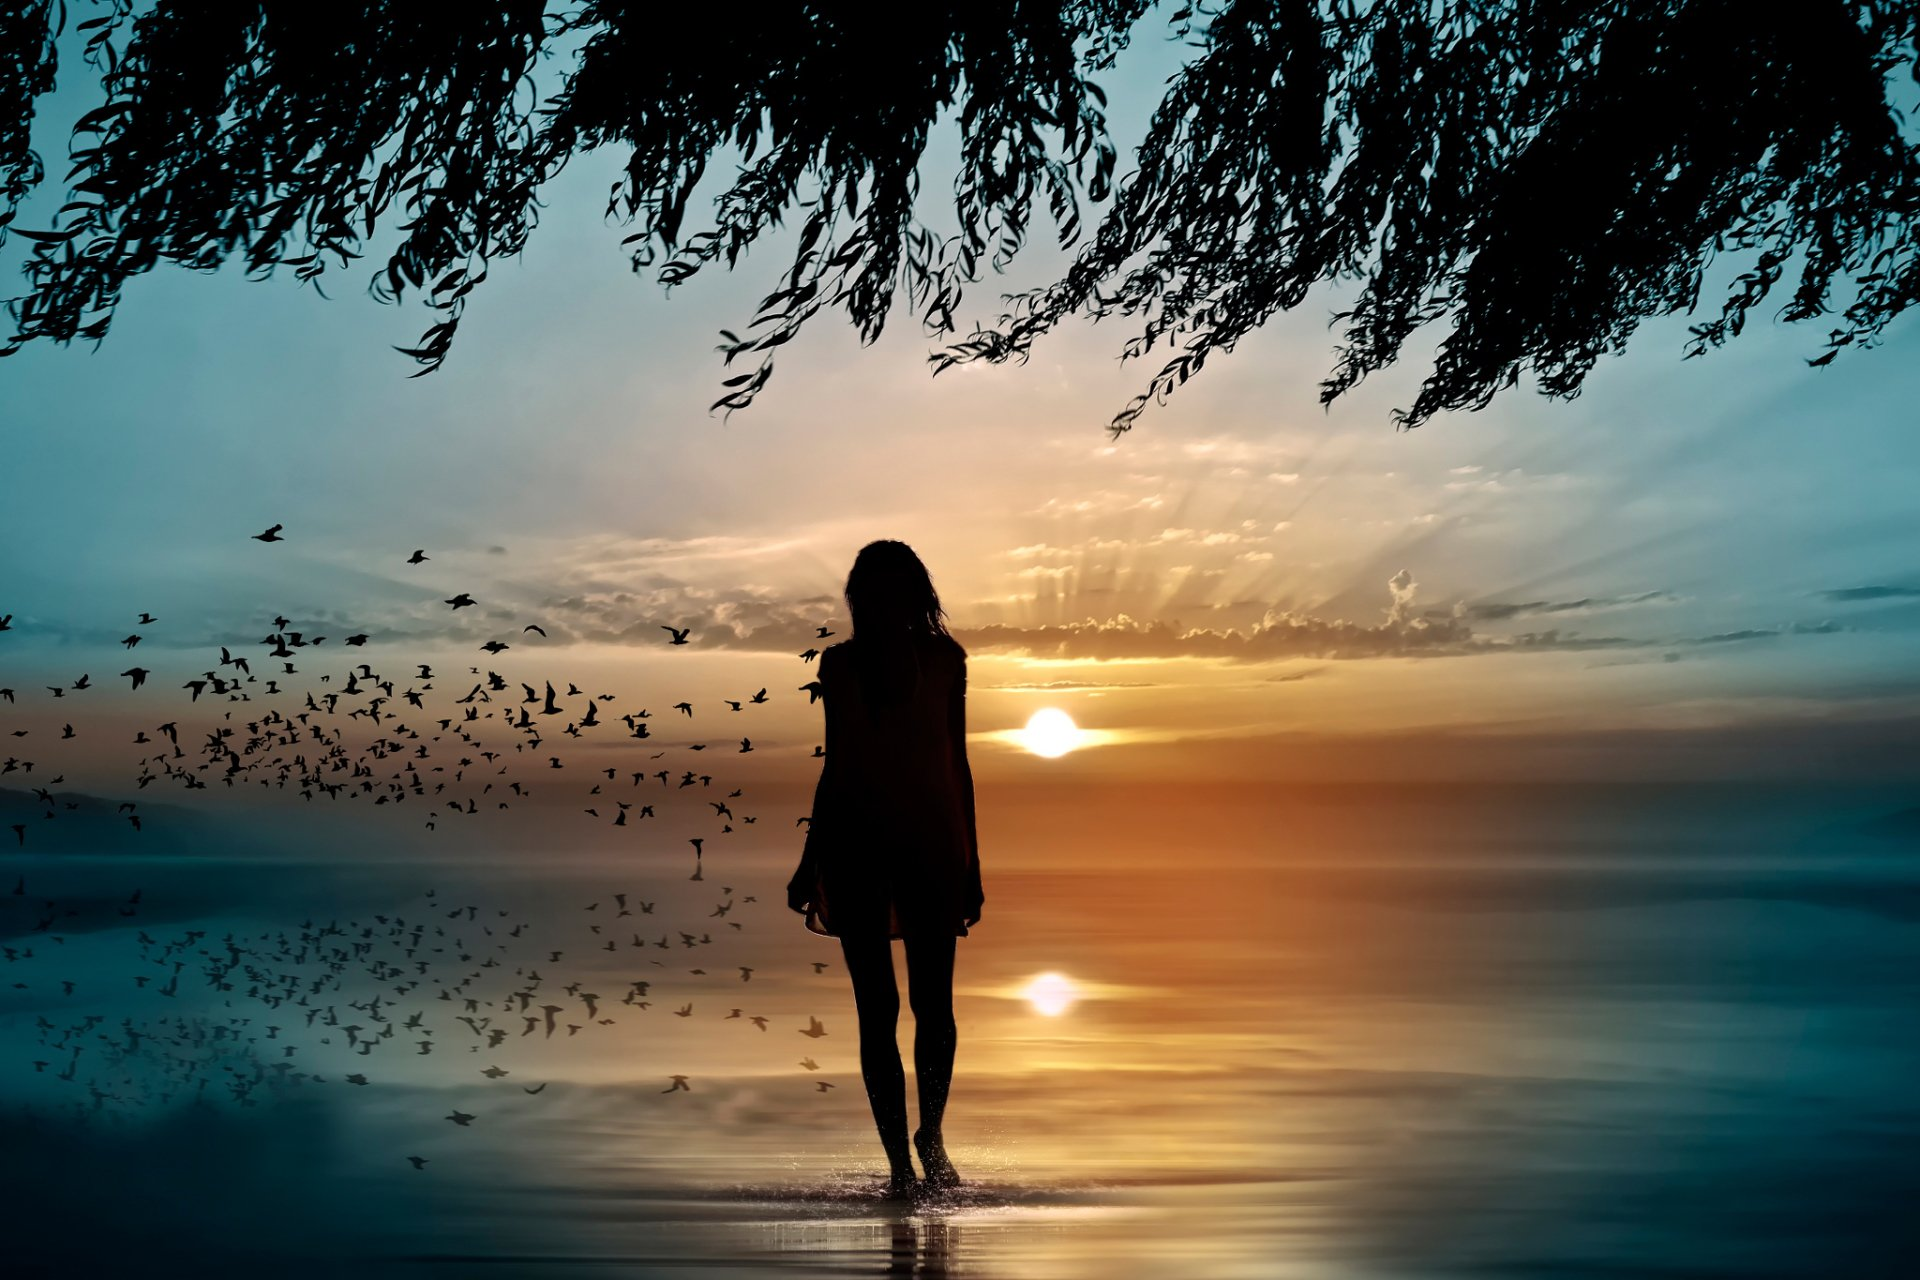 Artistic - Women  Woman Girl Rear Sunrise Reflection Silhouette Bird Sky Wallpaper